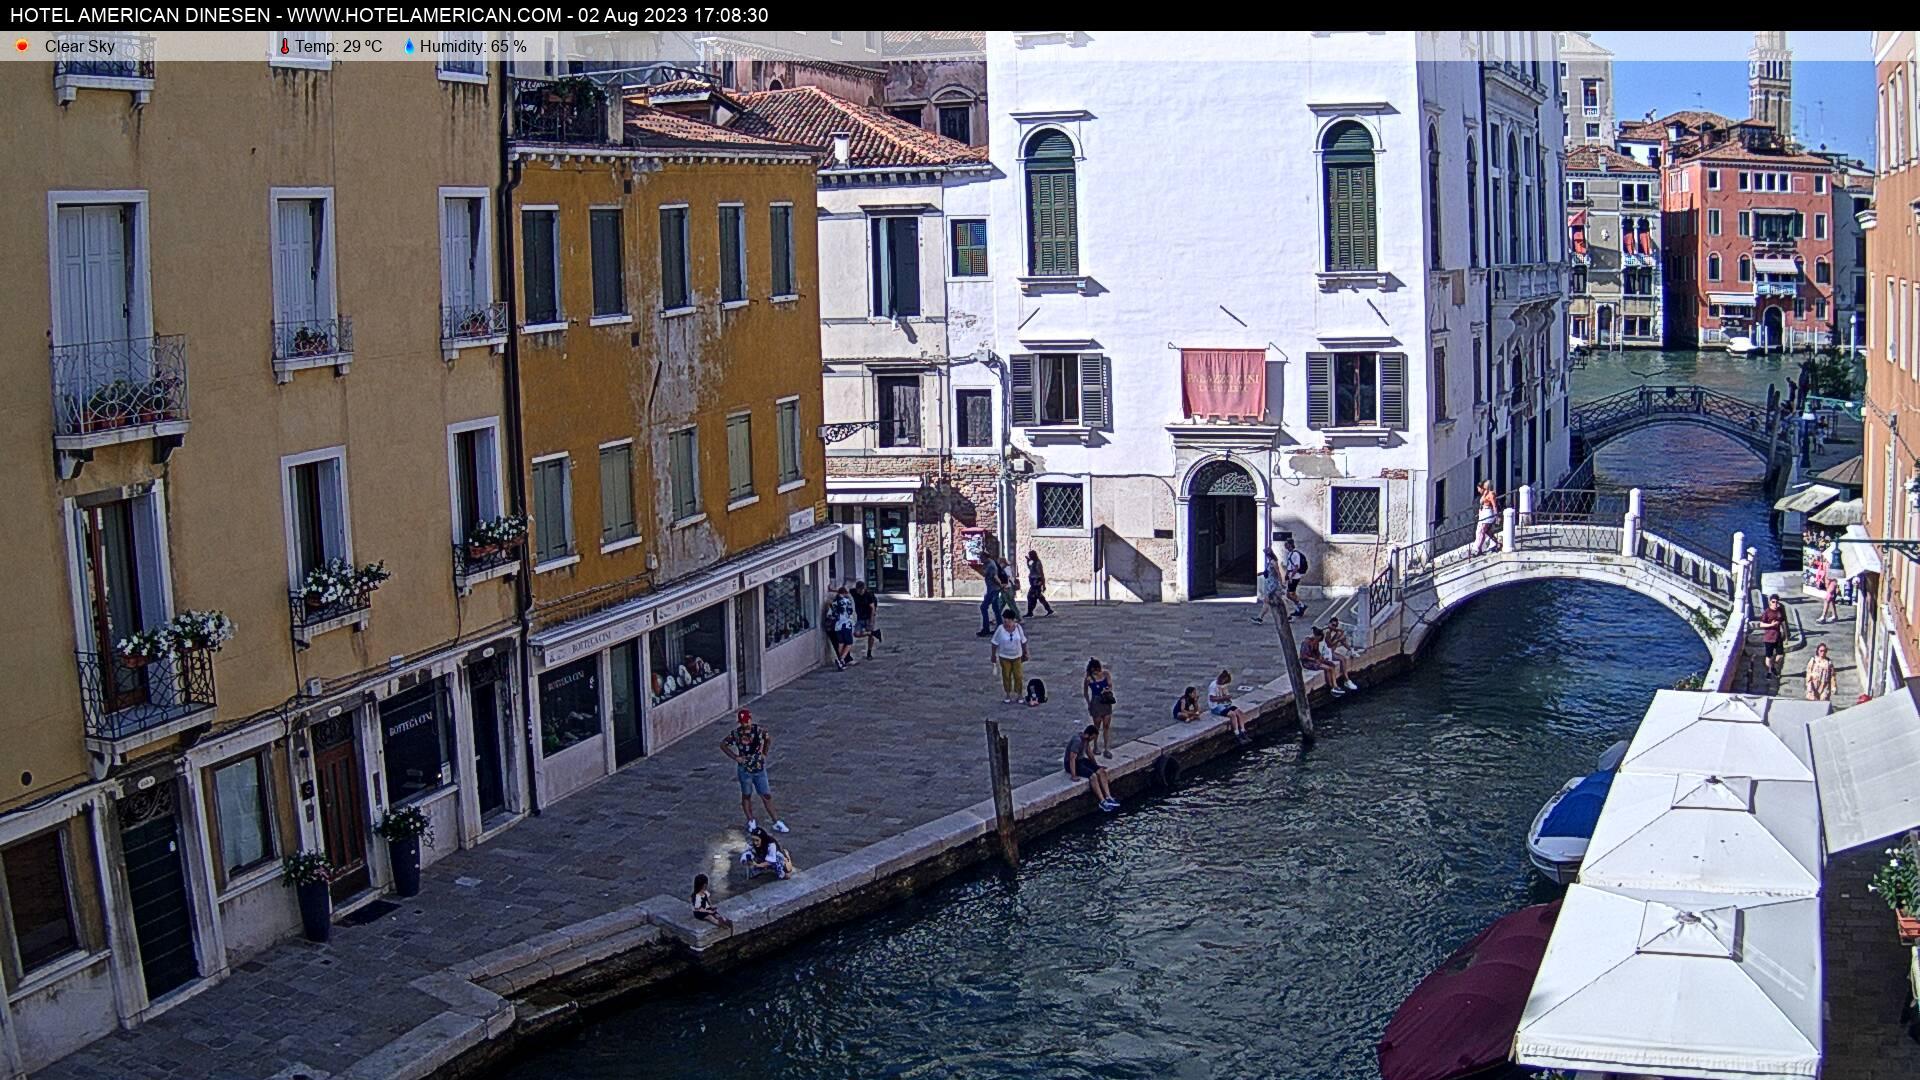 Venedig Sa. 17:08